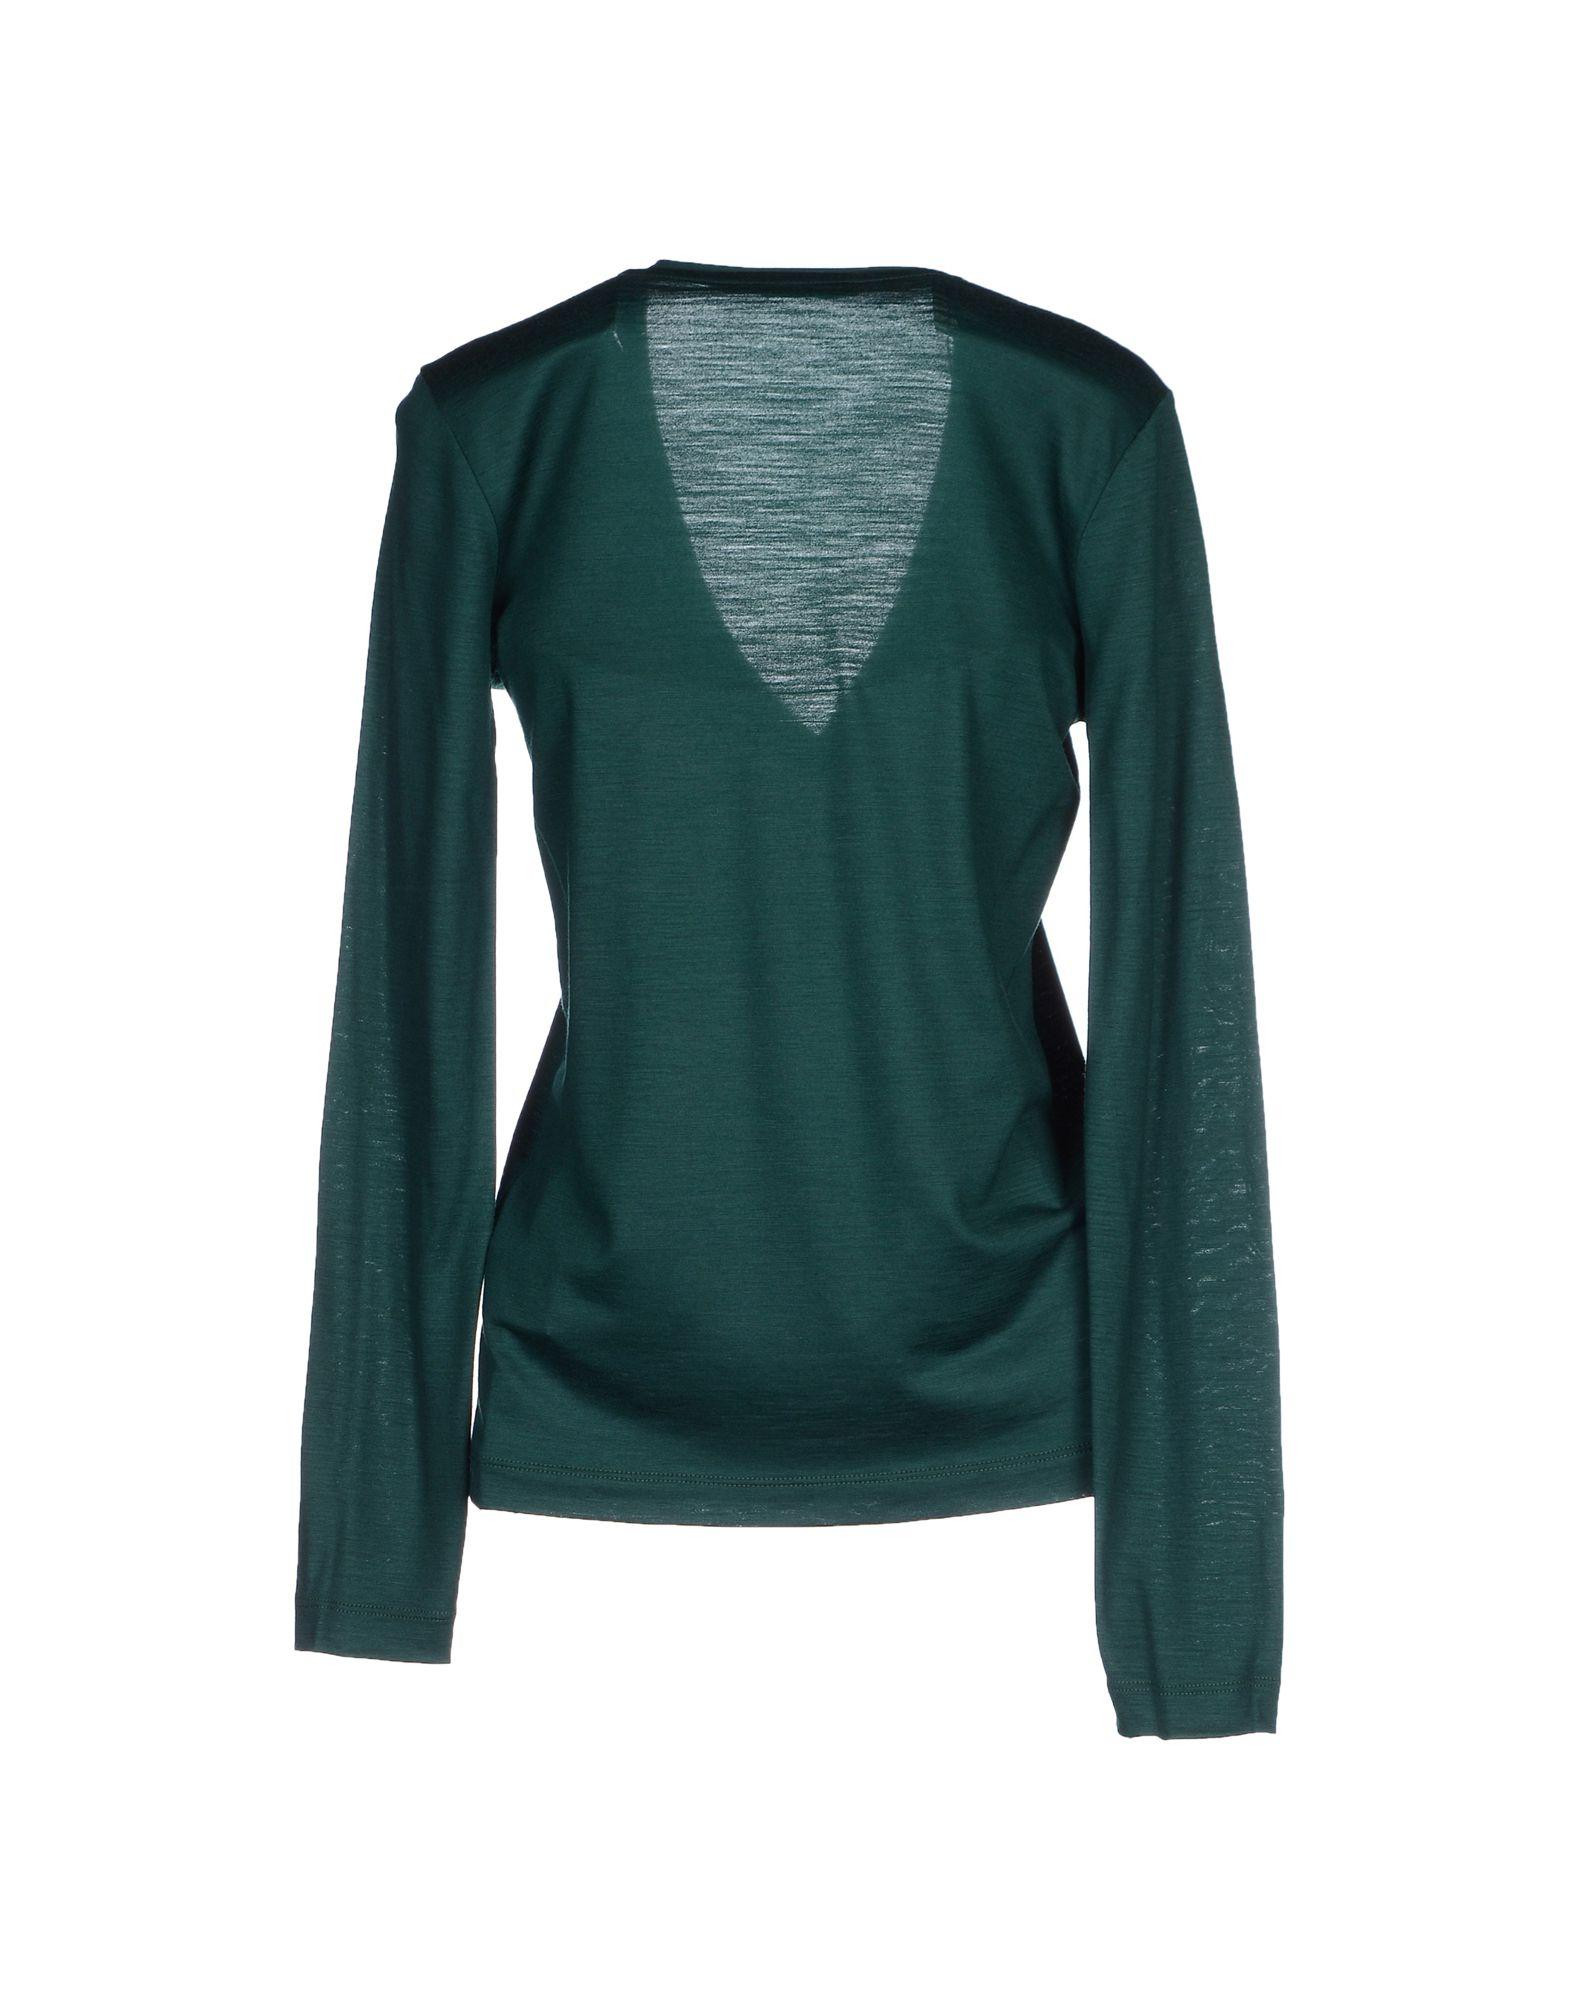 Dsquared t shirt in green for men dark green lyst for Green mens t shirt